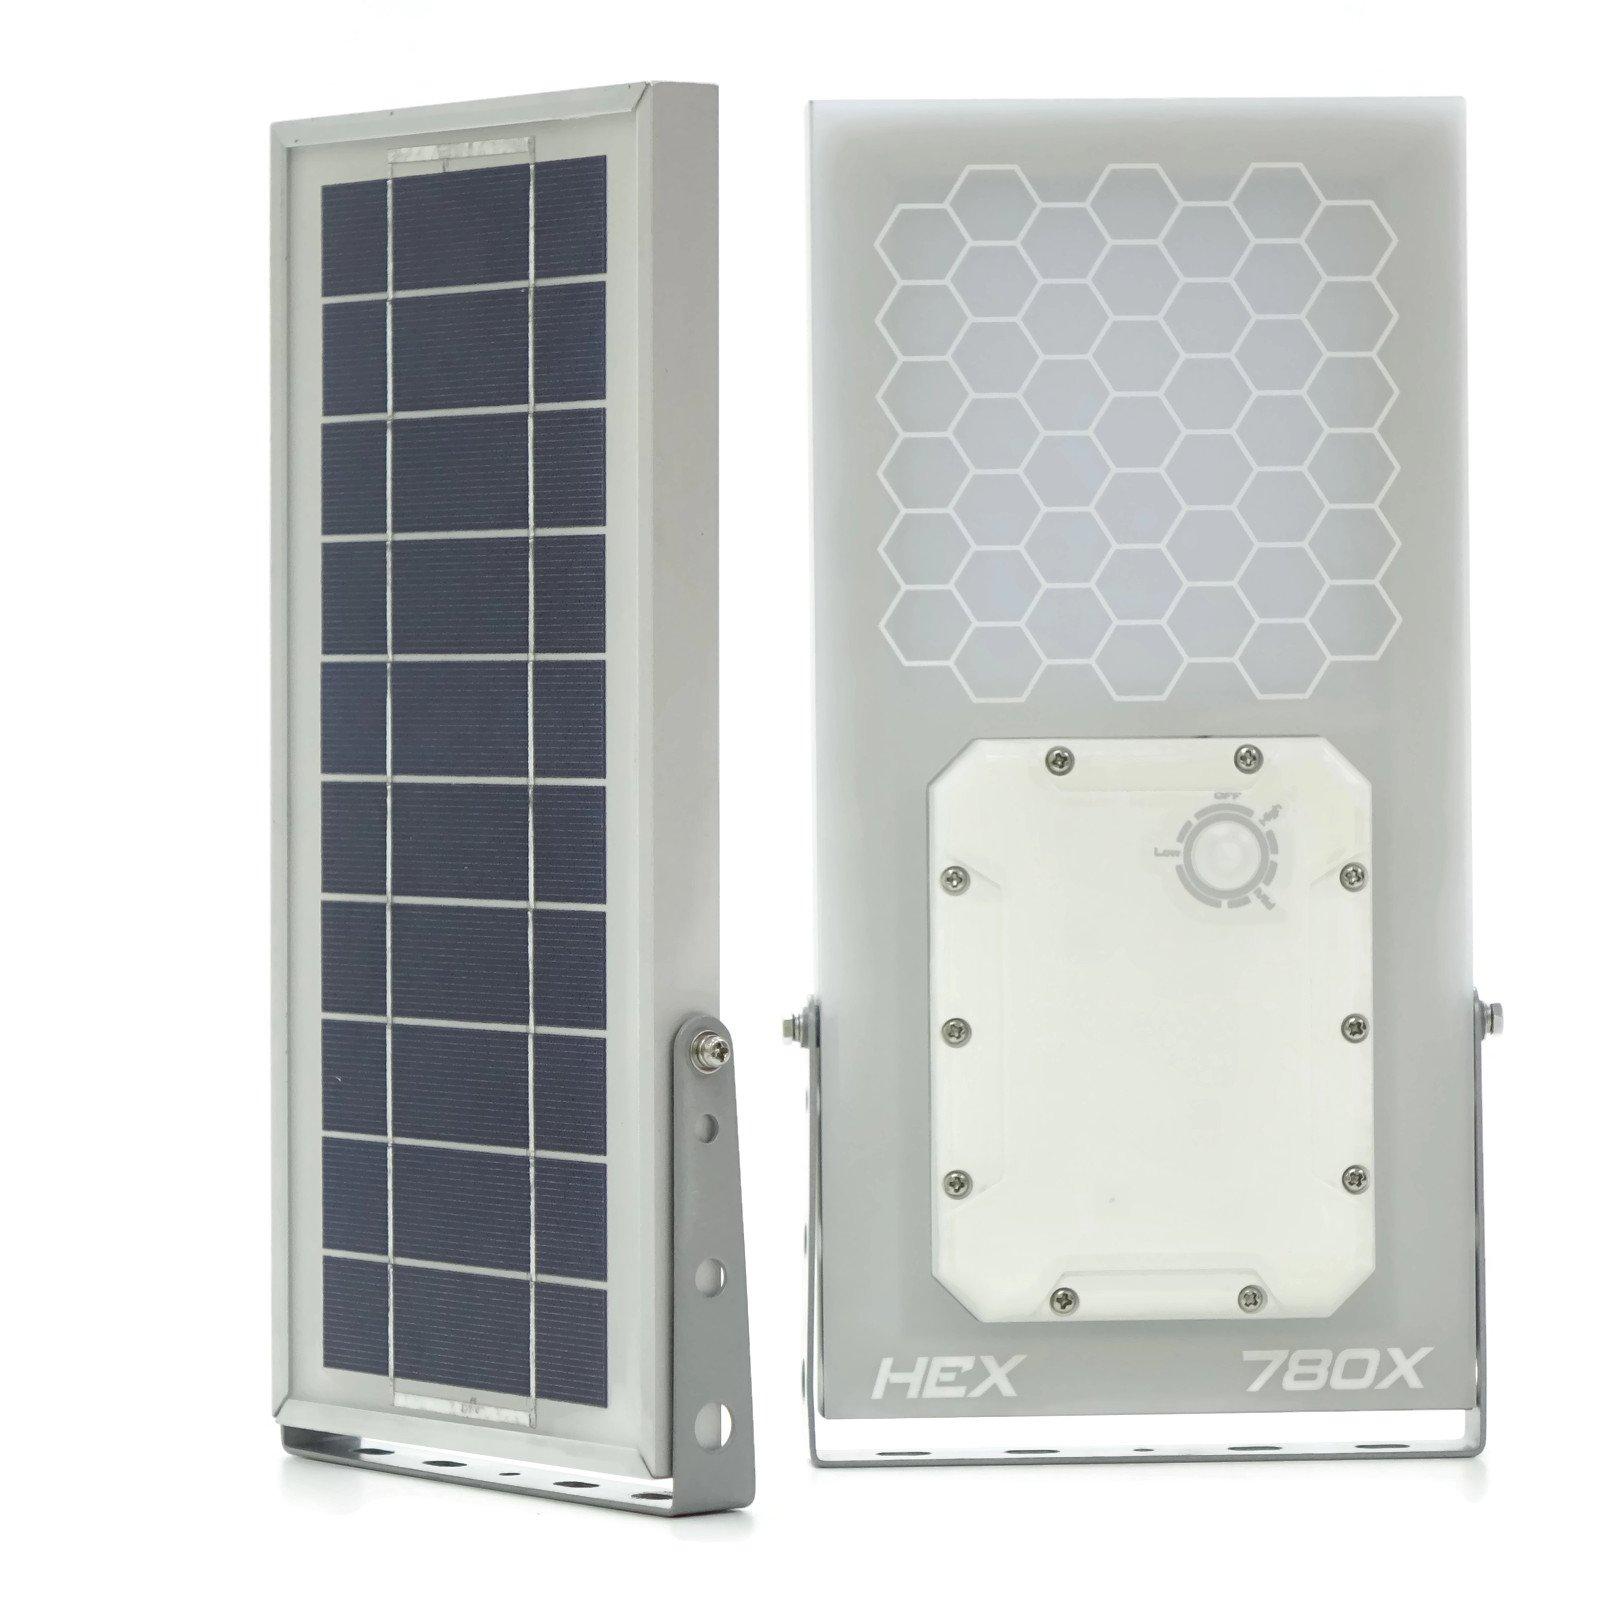 Solar Wall Light // HEX 780X Solar Wall Light (Warm White LED) // 3-Level Power Setting // Solar Light